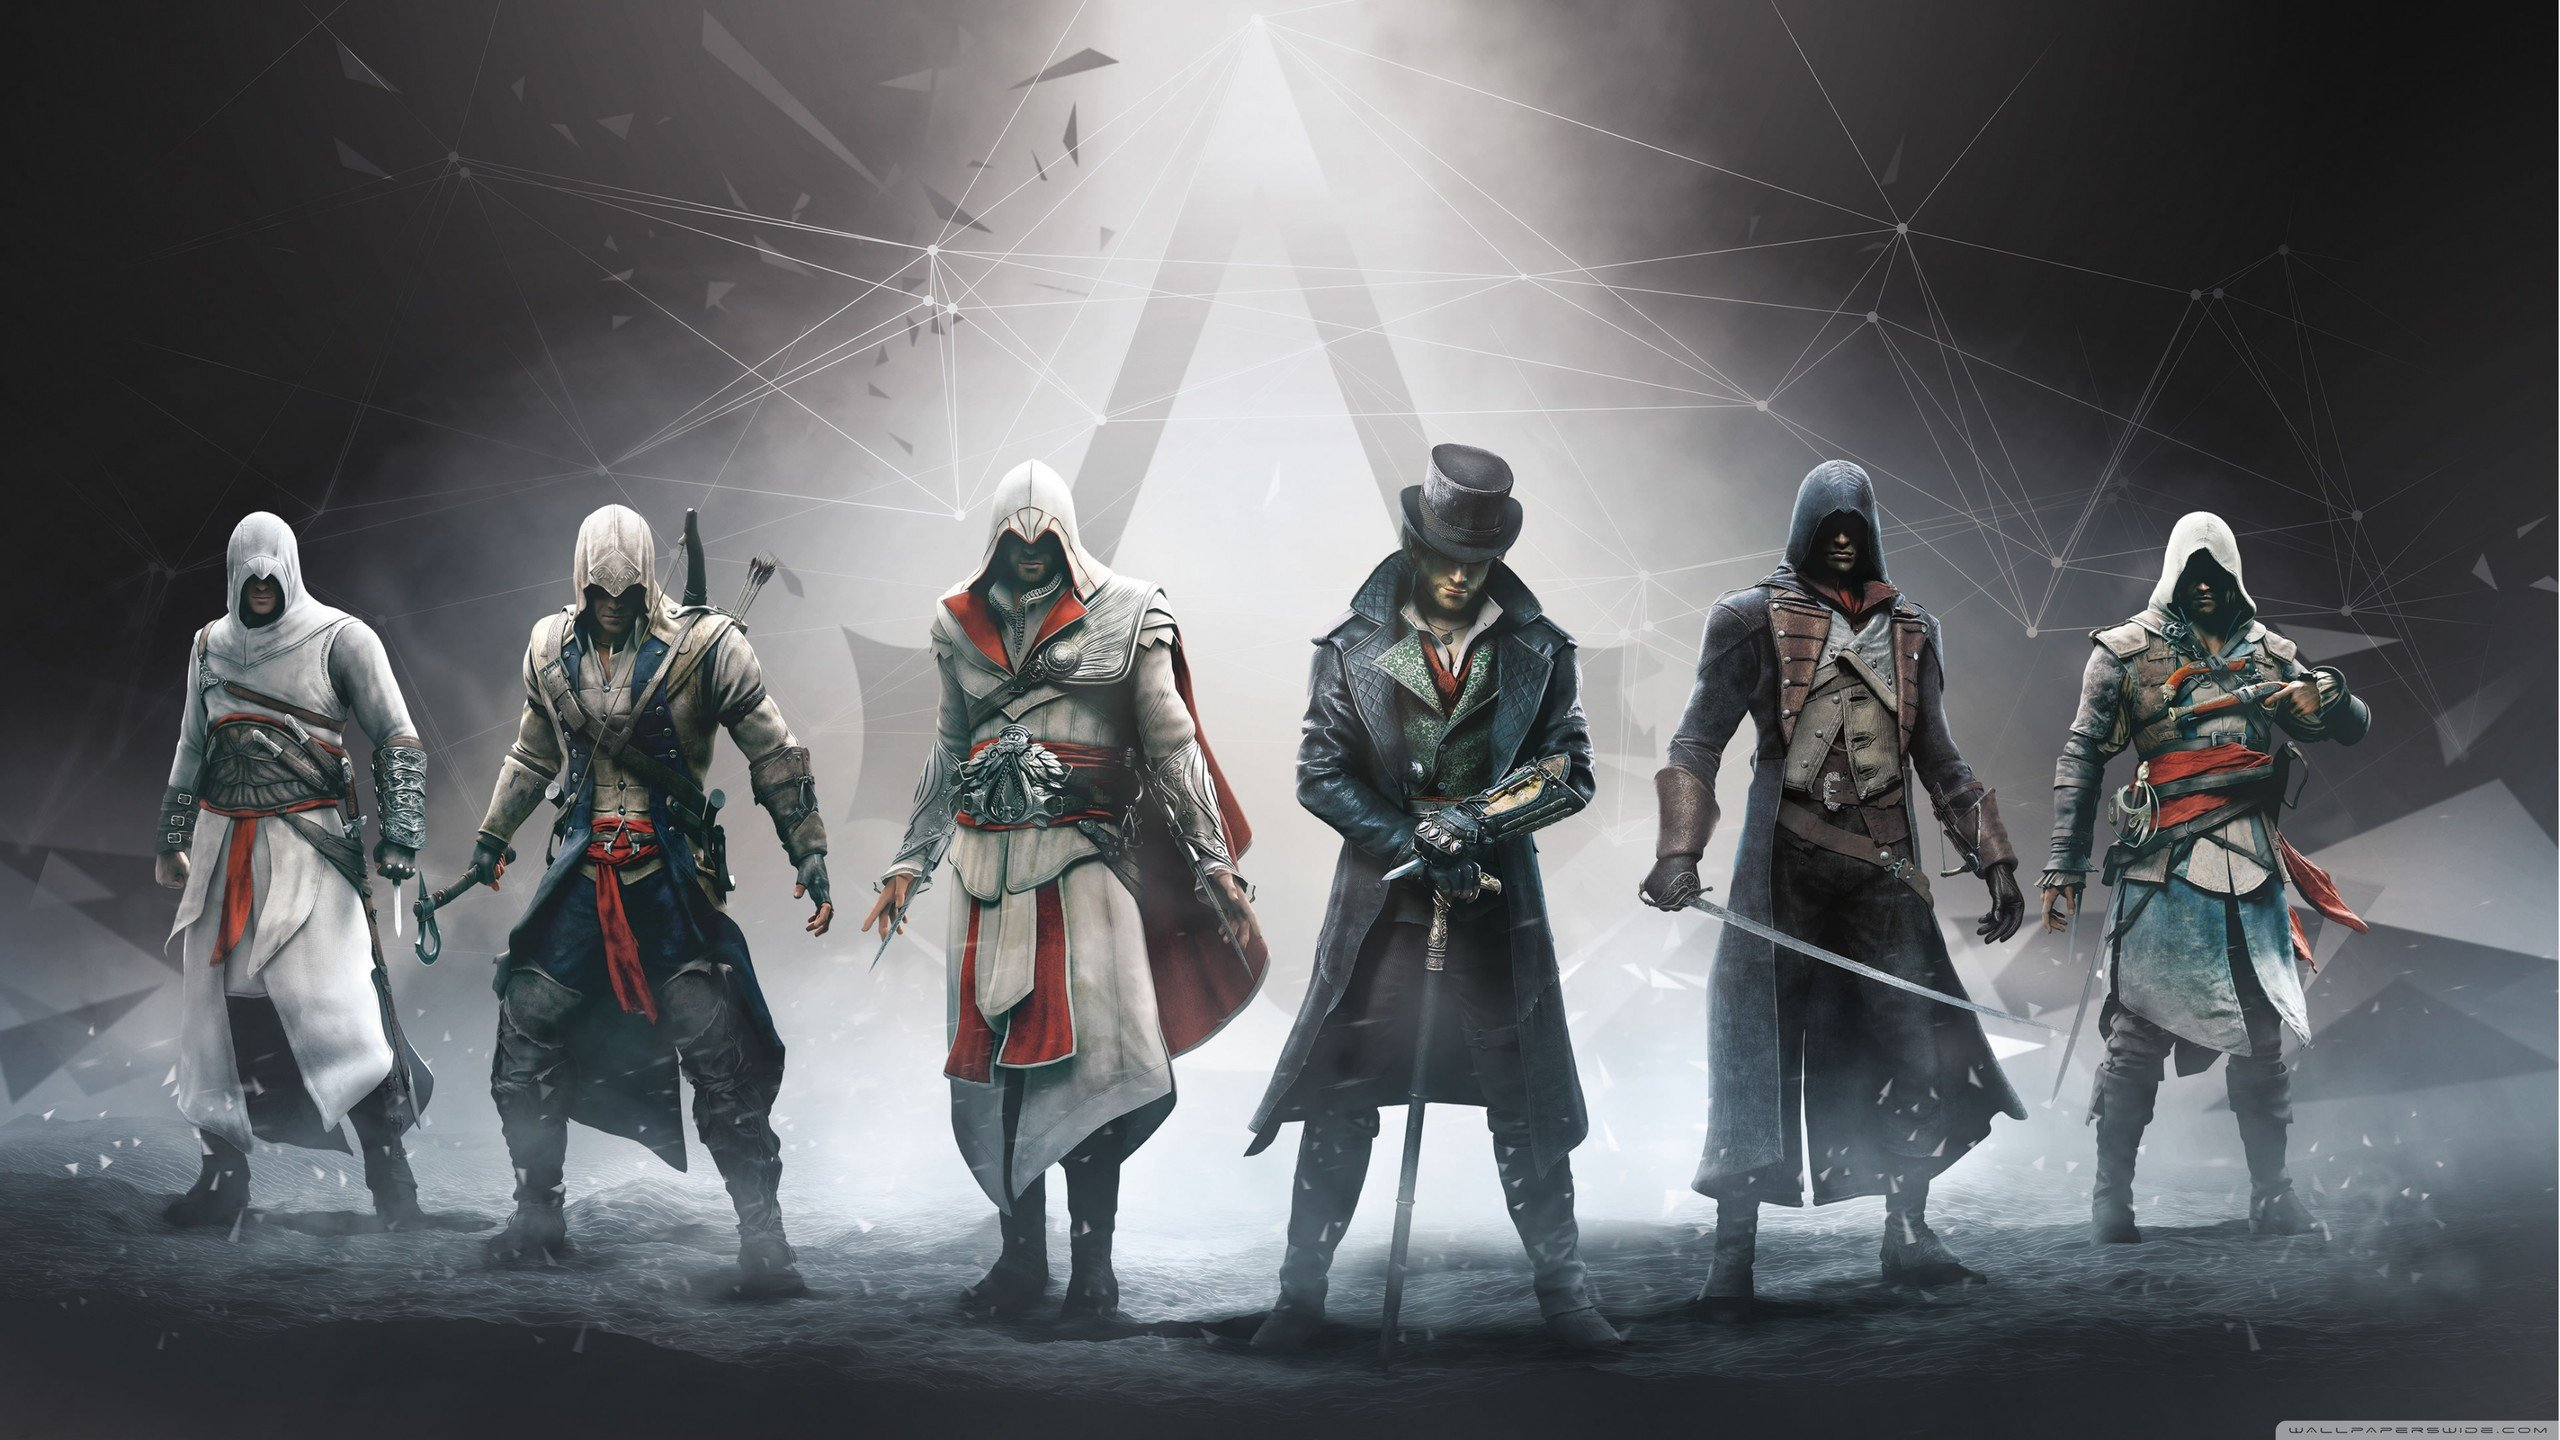 Assassins Creed Ultra HD Duvar kağıdı